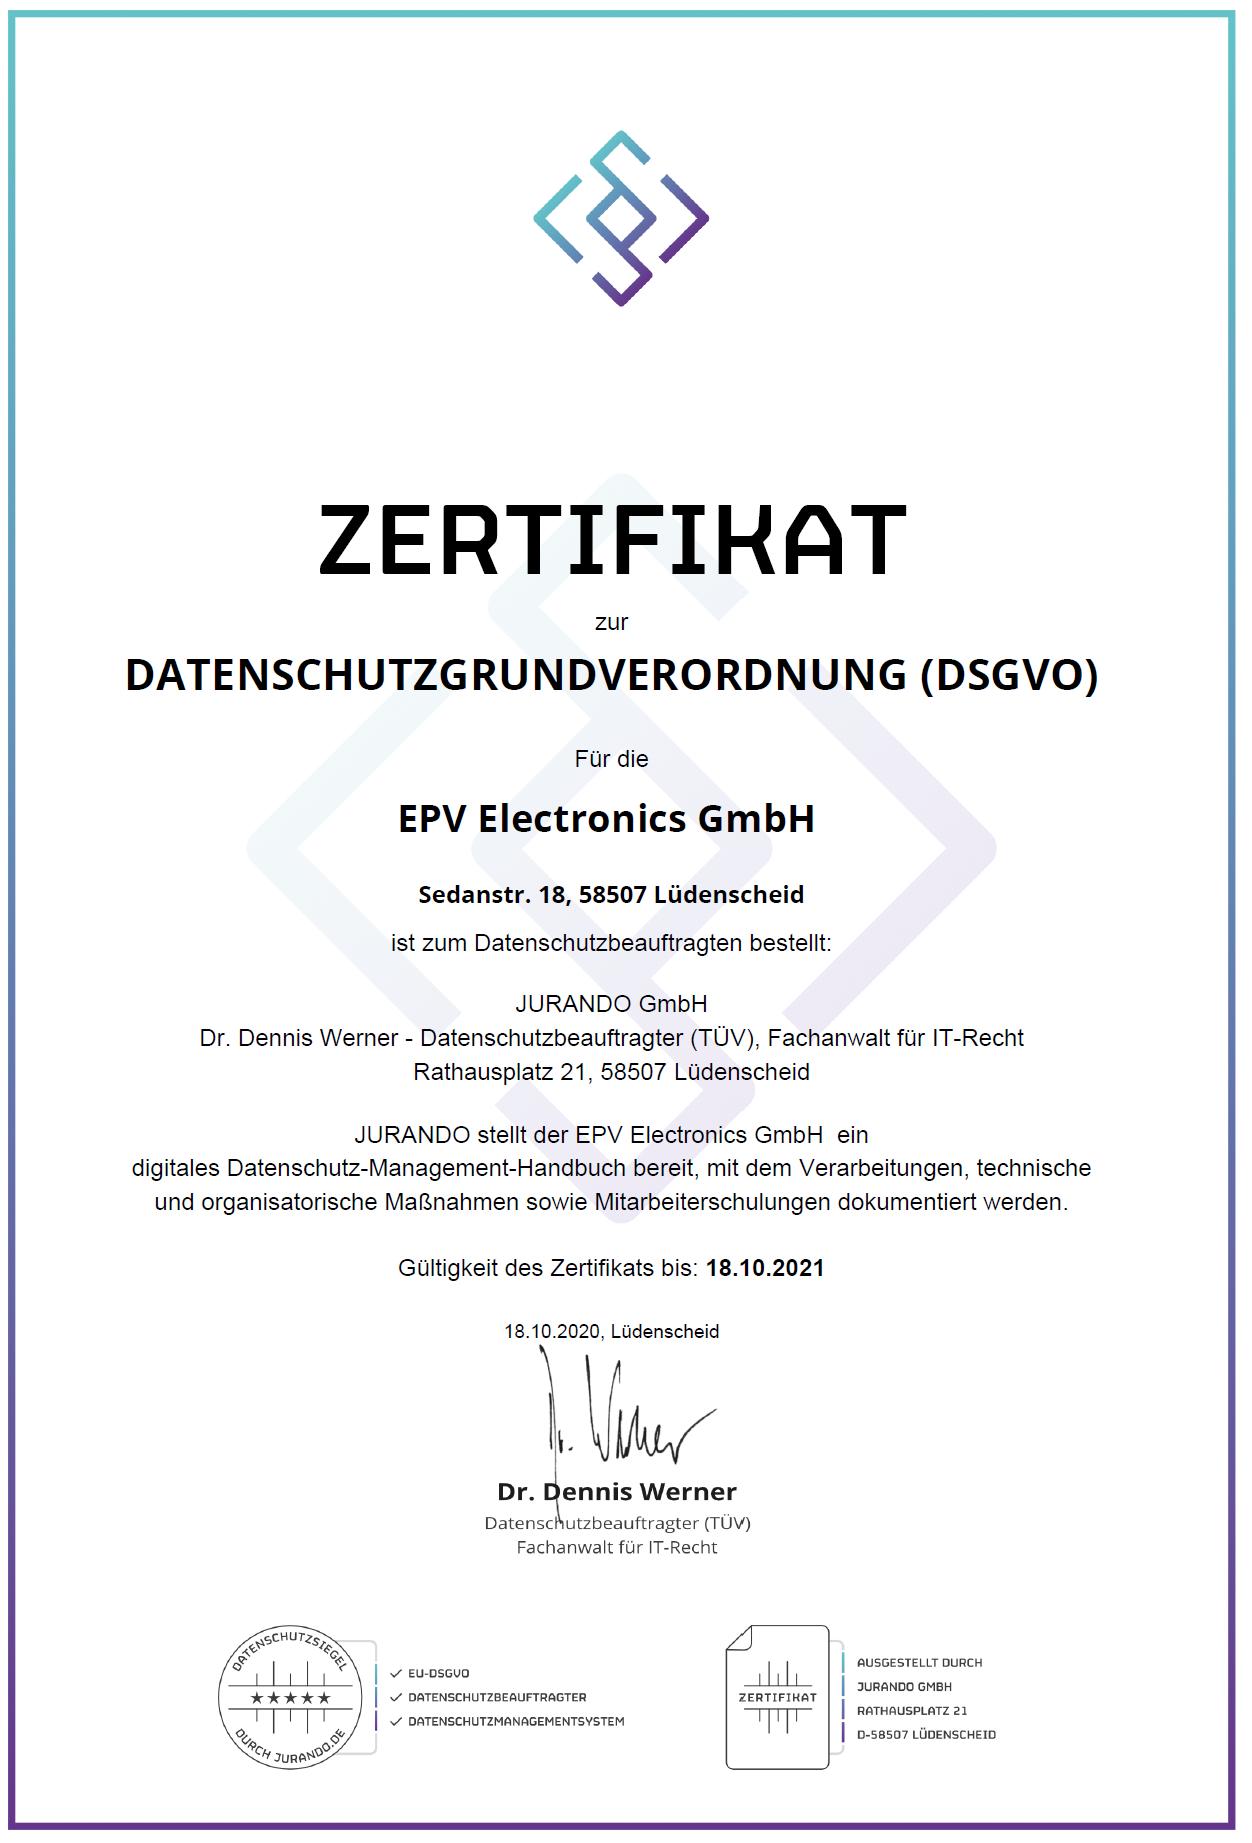 TRAPMASTER DSGVO Zertifikat